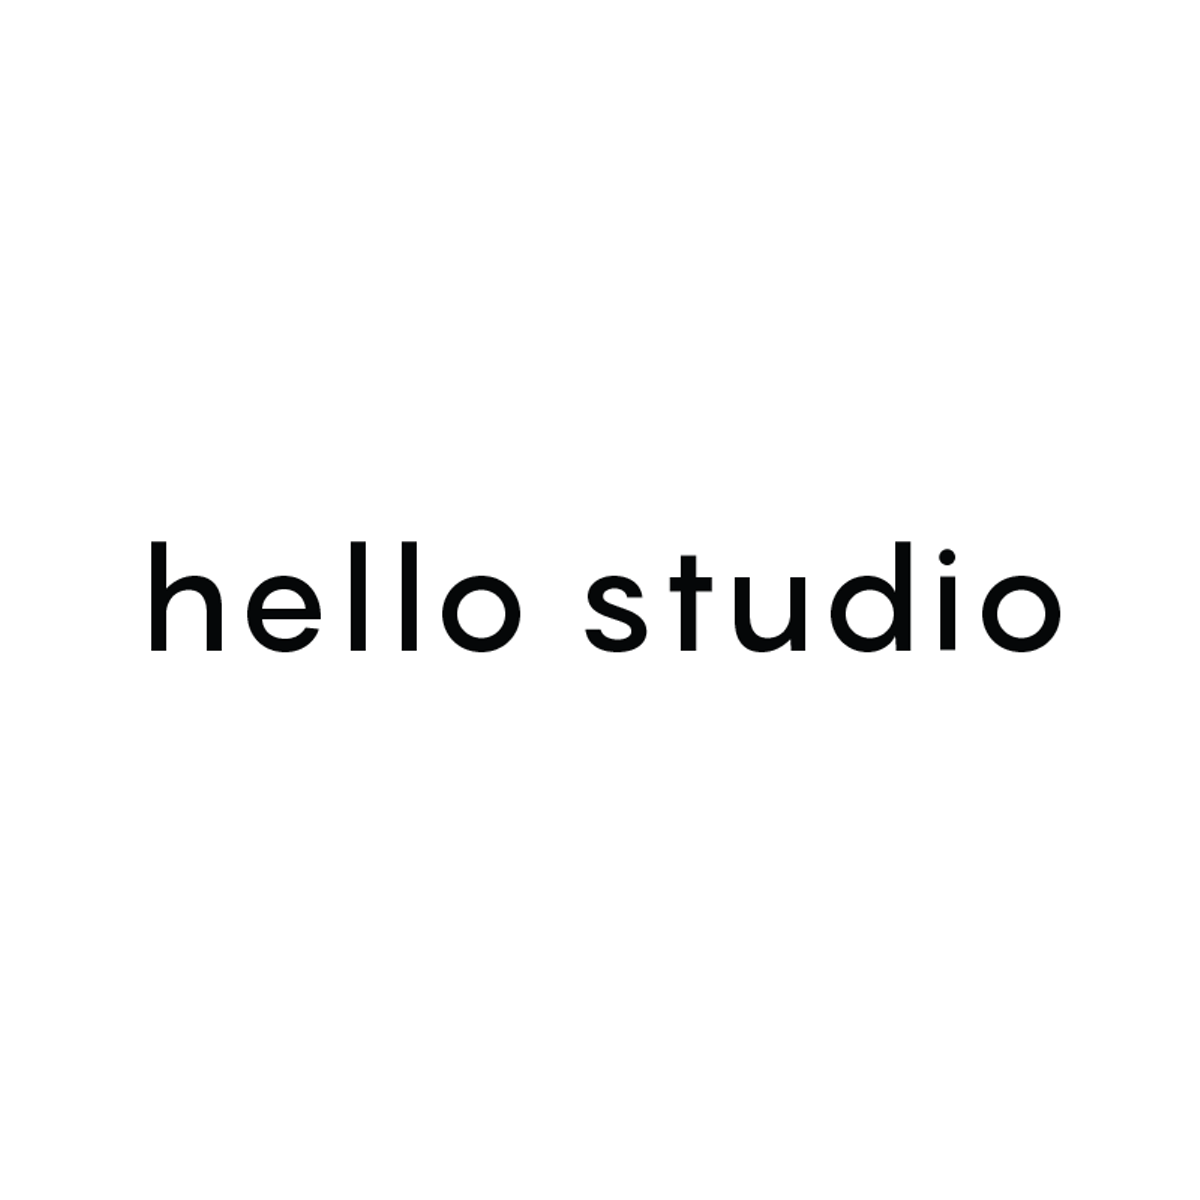 hello_studio_.png